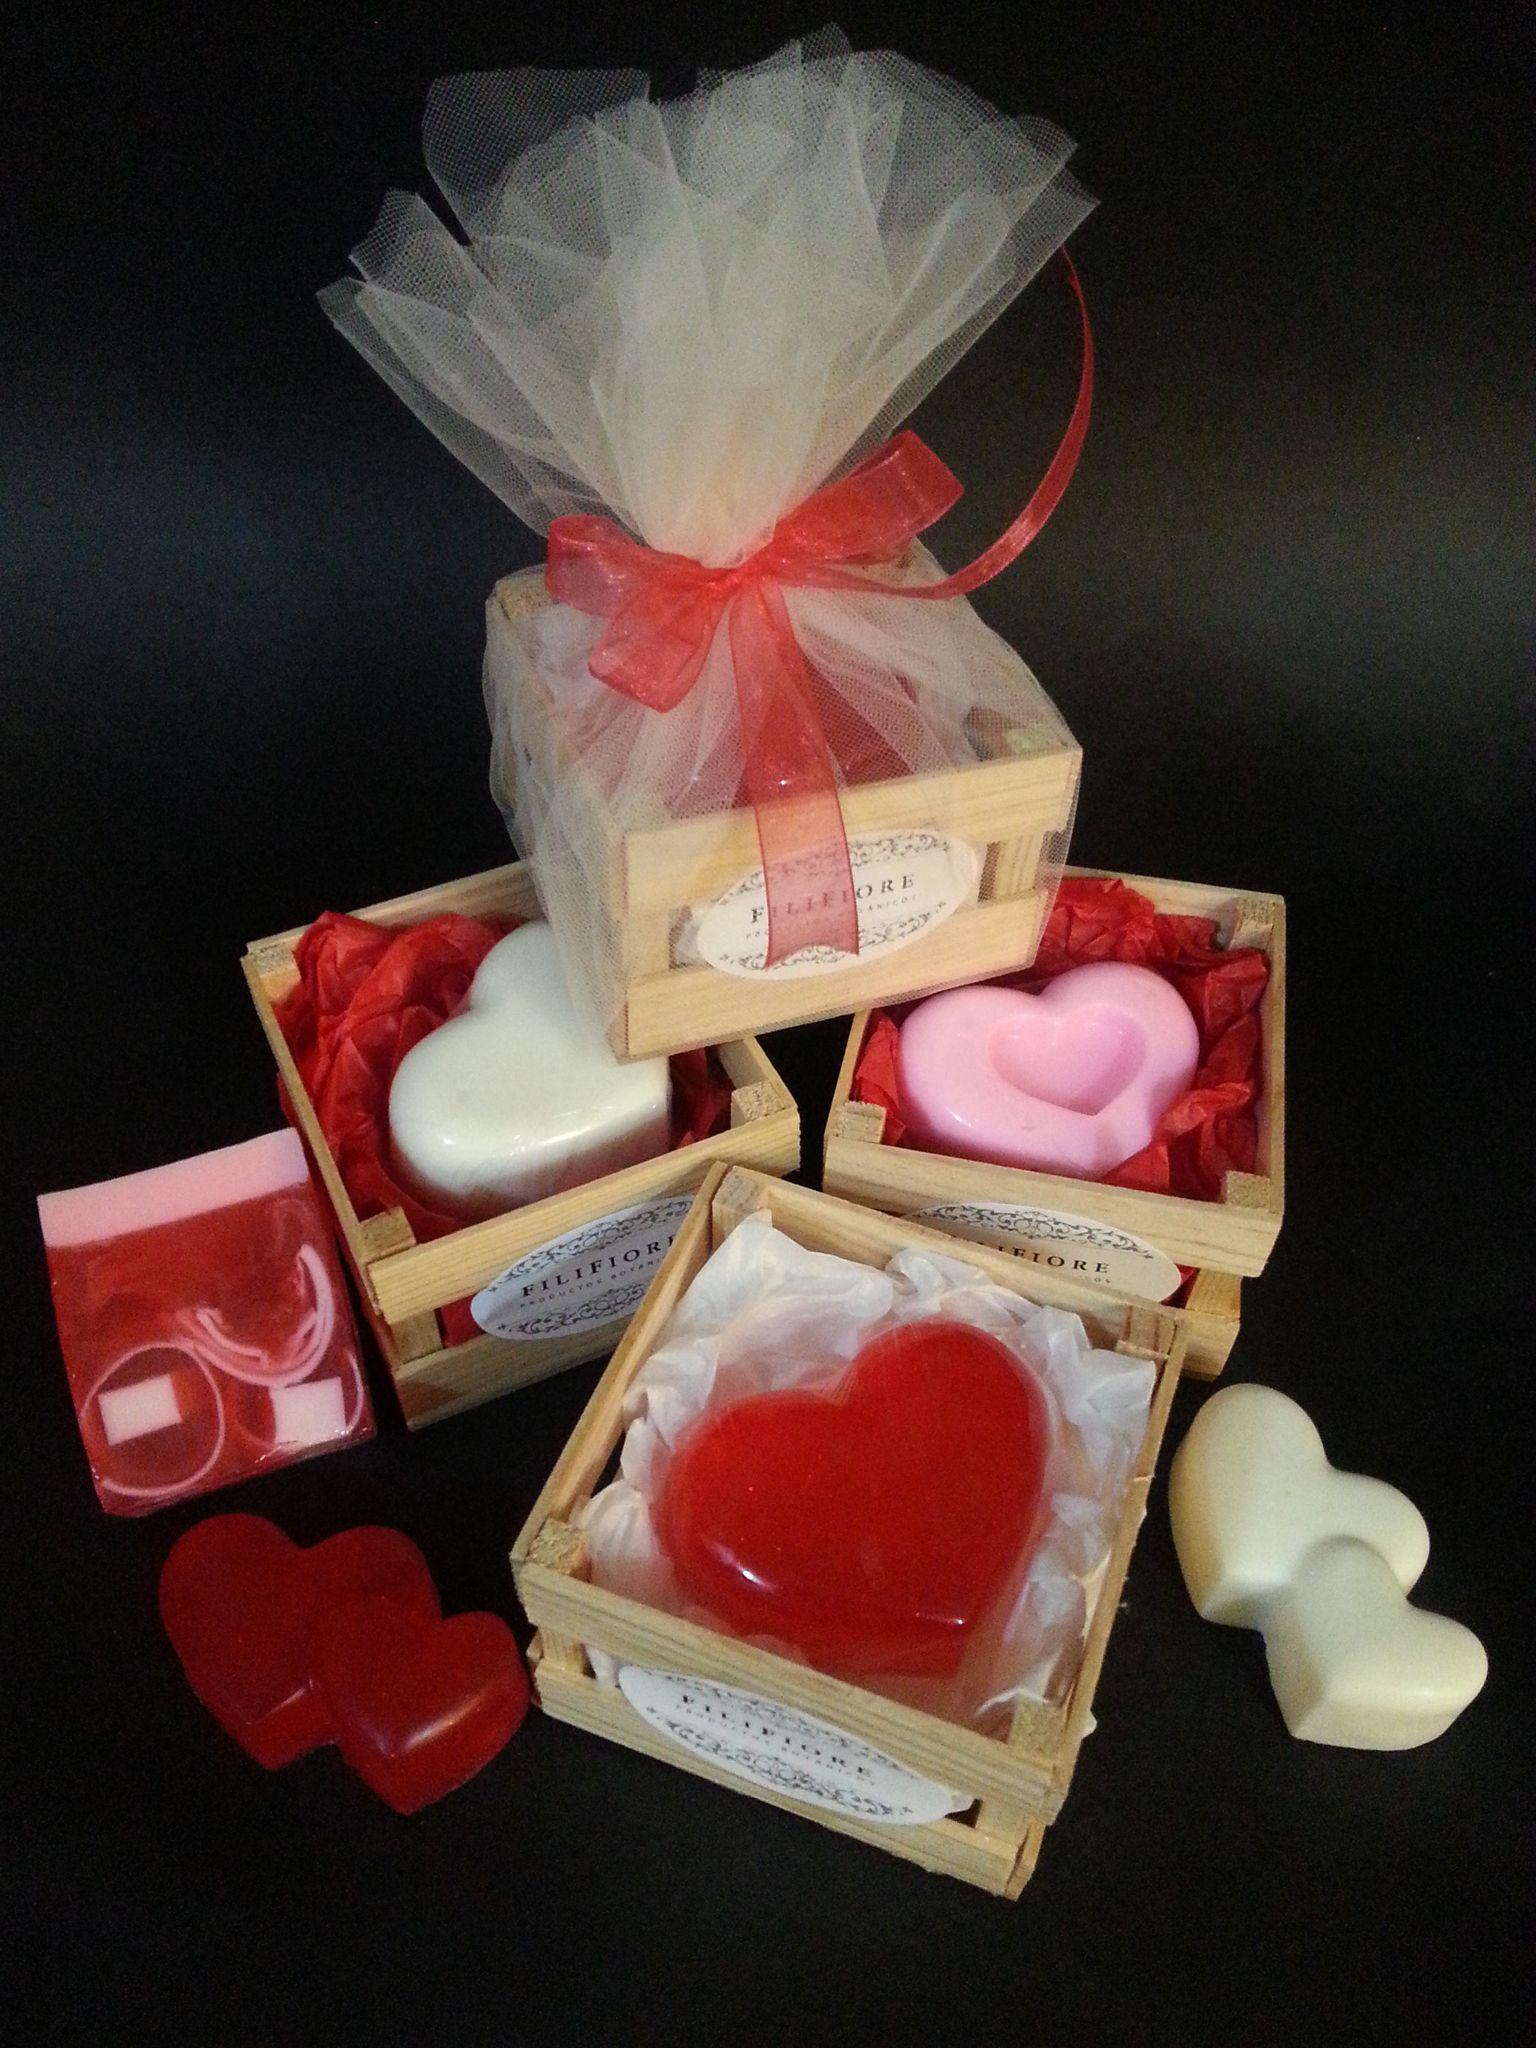 San Valentin Soaps O Jabones De Coraz N 14 De Febrero  ~ Detalles Con Fotos Para Regalar